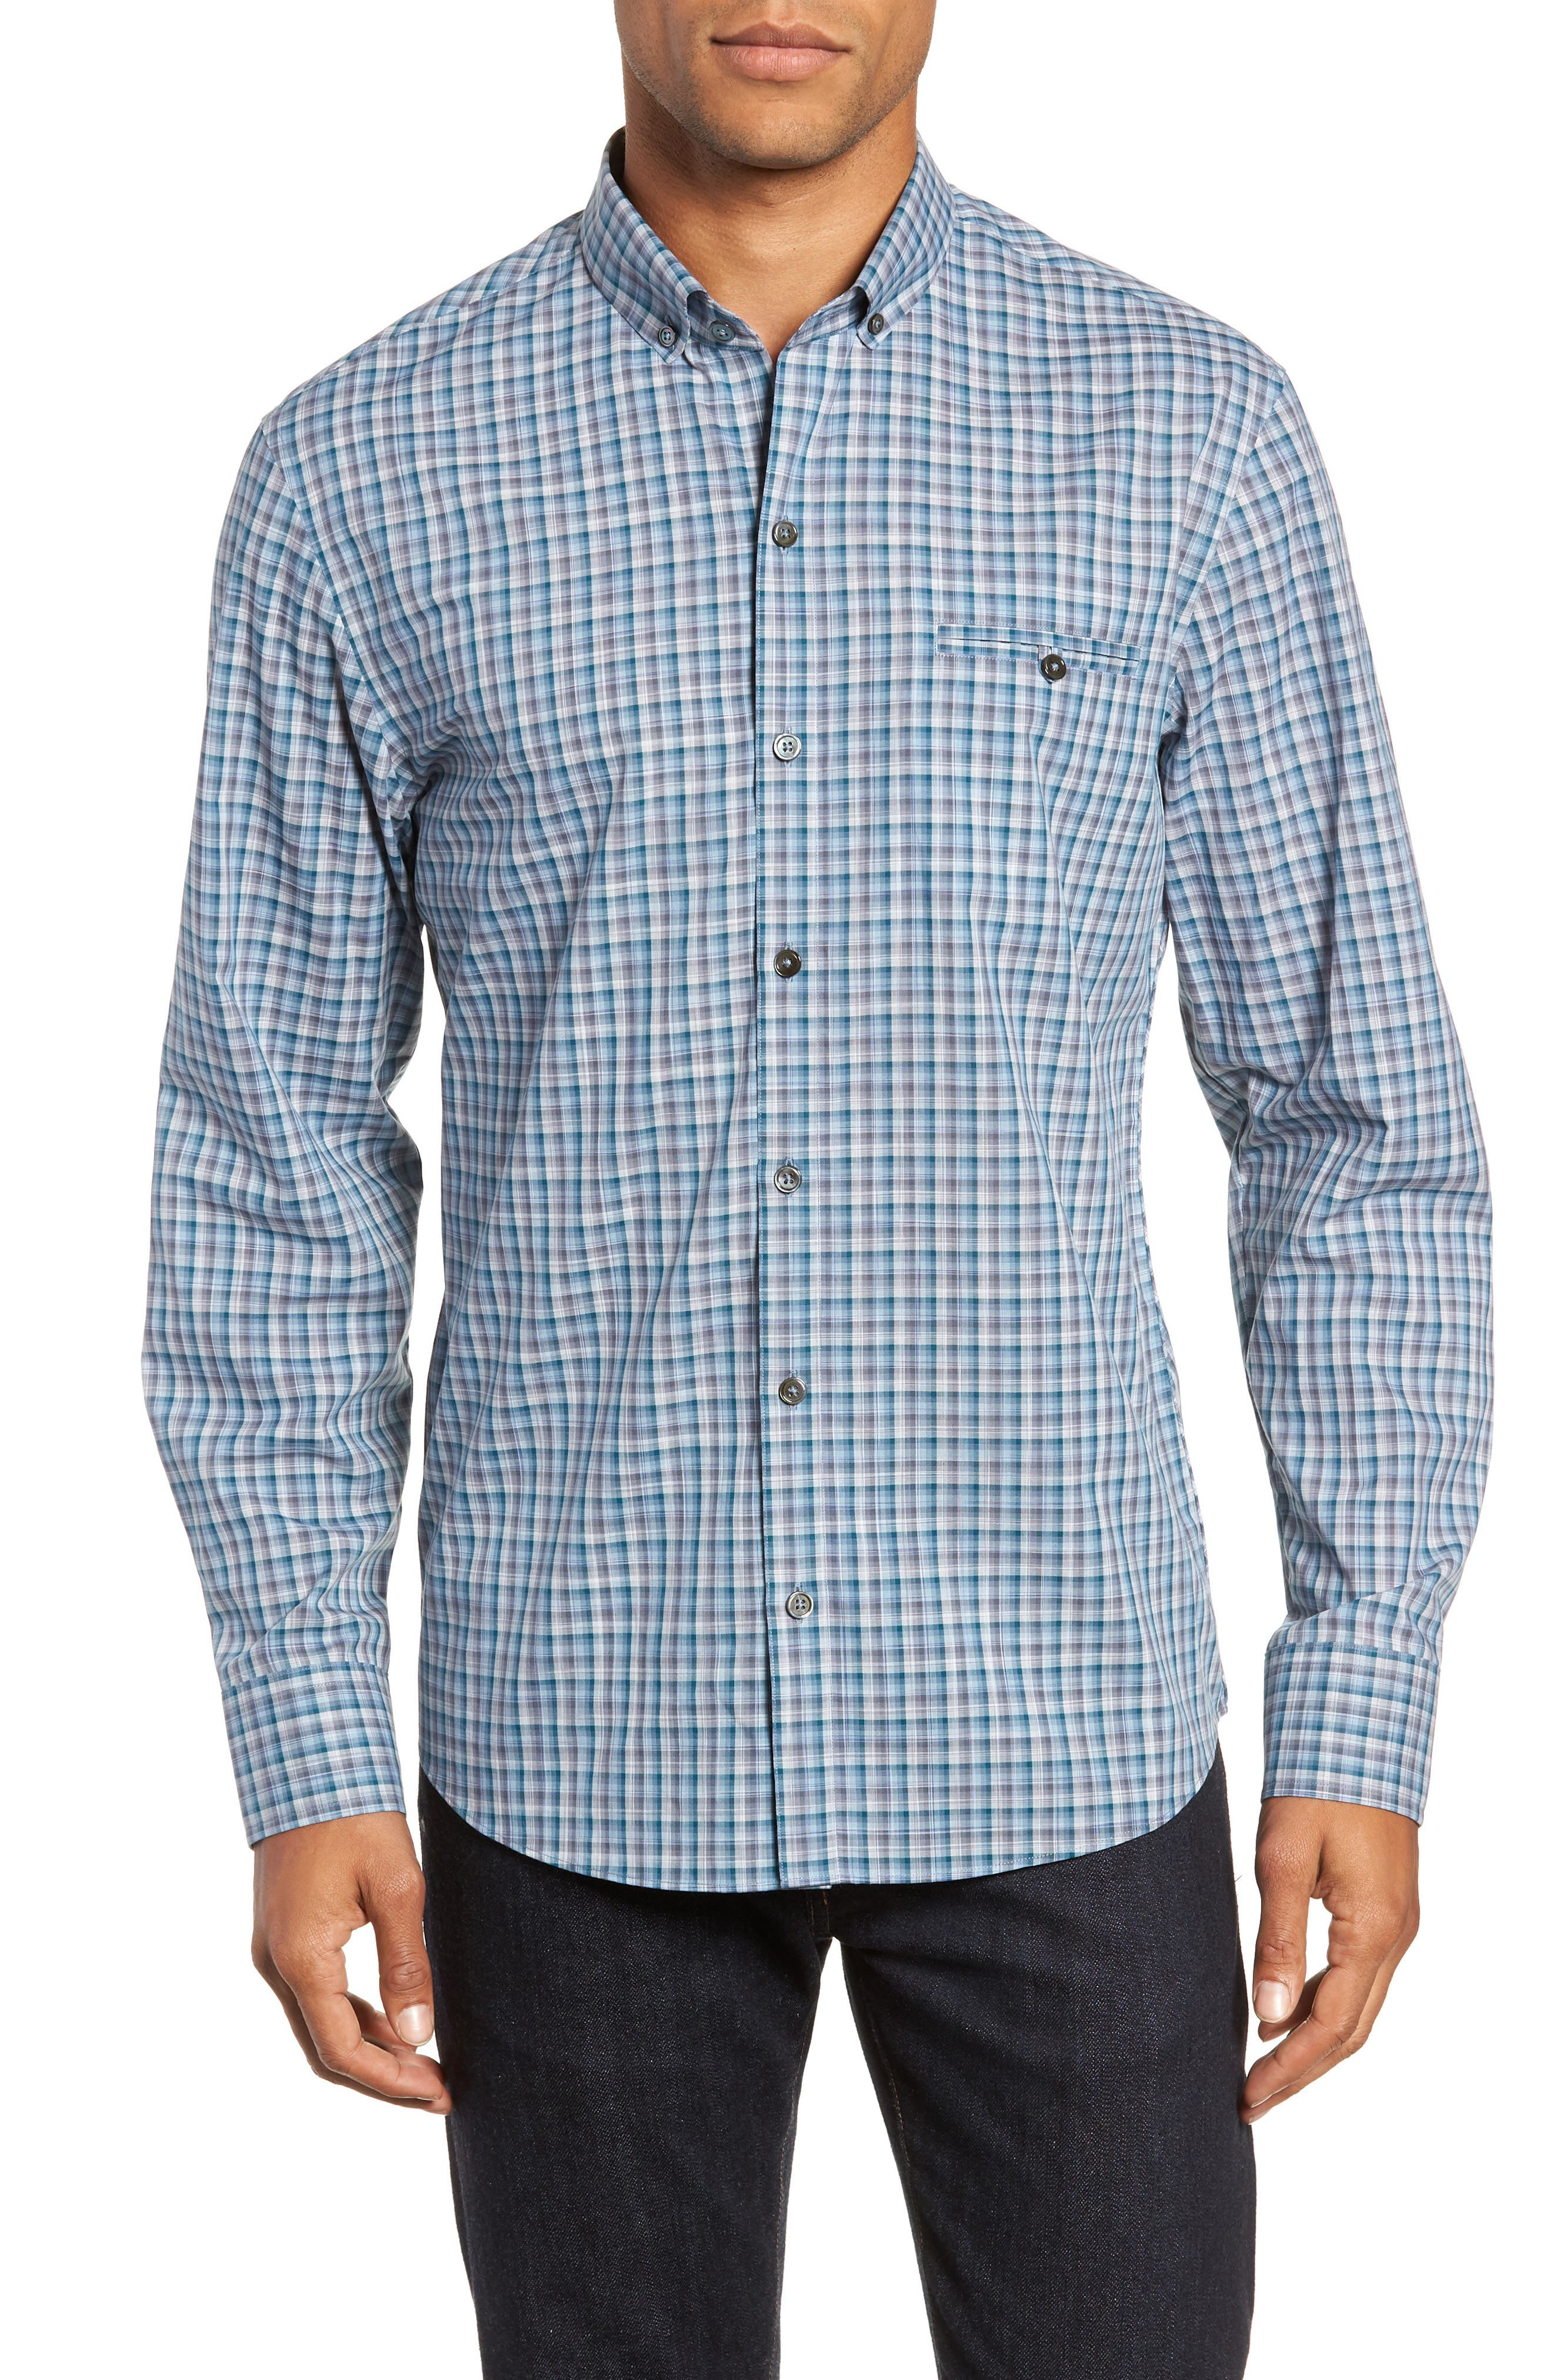 Godinez Check Sport Shirt,                         Main,                         color, DARK TEAL